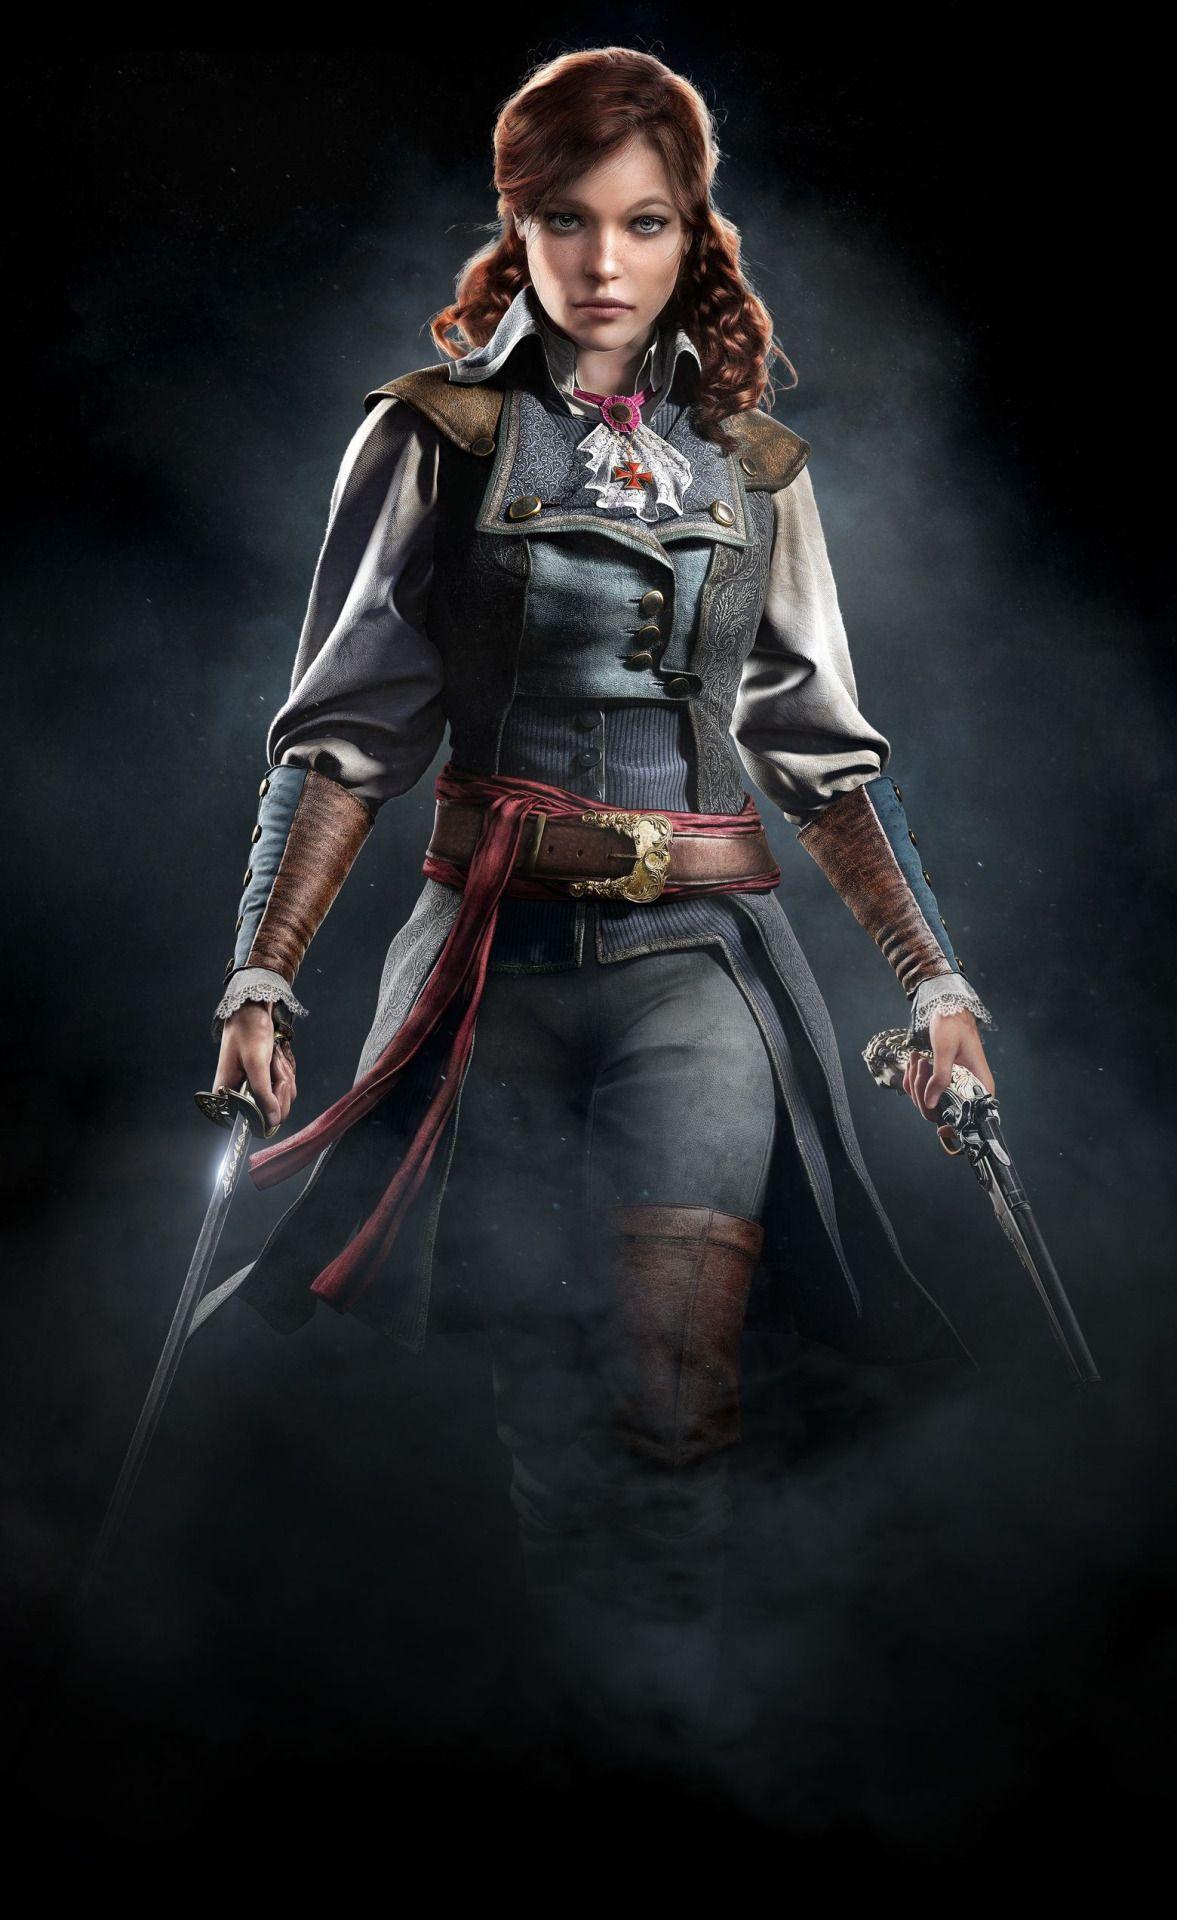 Assassins Creed Unity | Assassins creed art, Assassins